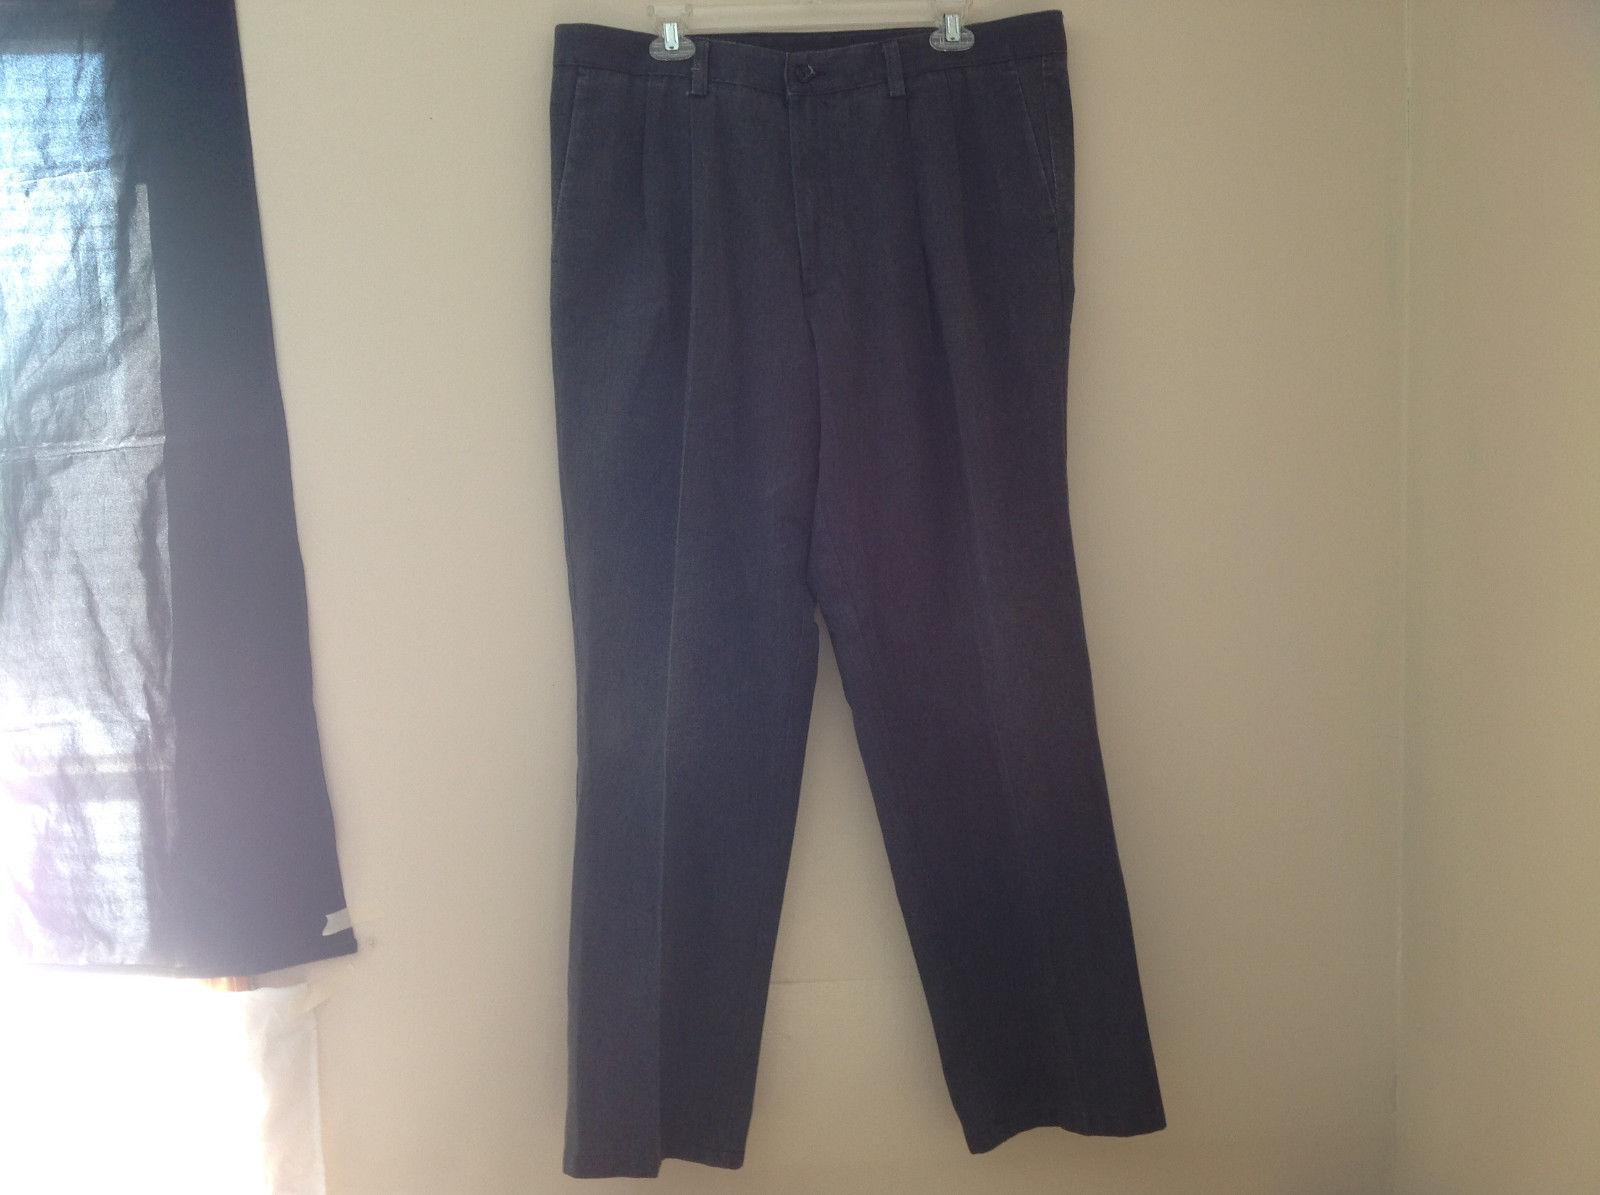 Dark Gray Pleated 4 Pocket Casual Pants Button Zipper Closure Dockers Size 38